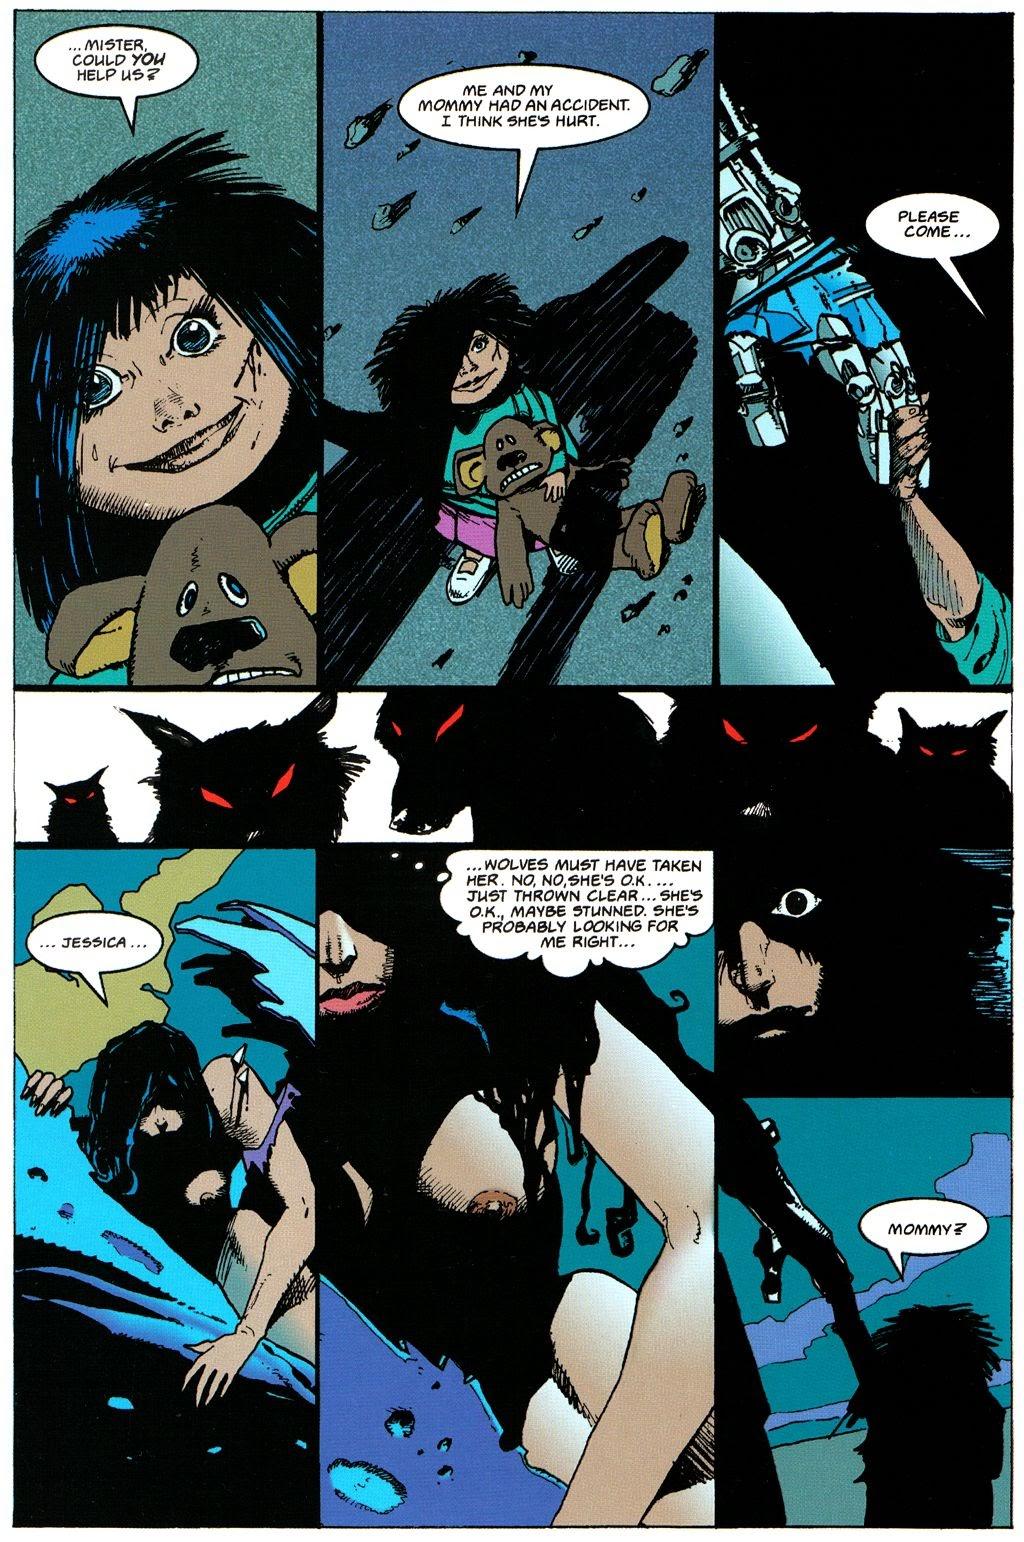 Read online Bisley's Scrapbook comic -  Issue # Full - 6